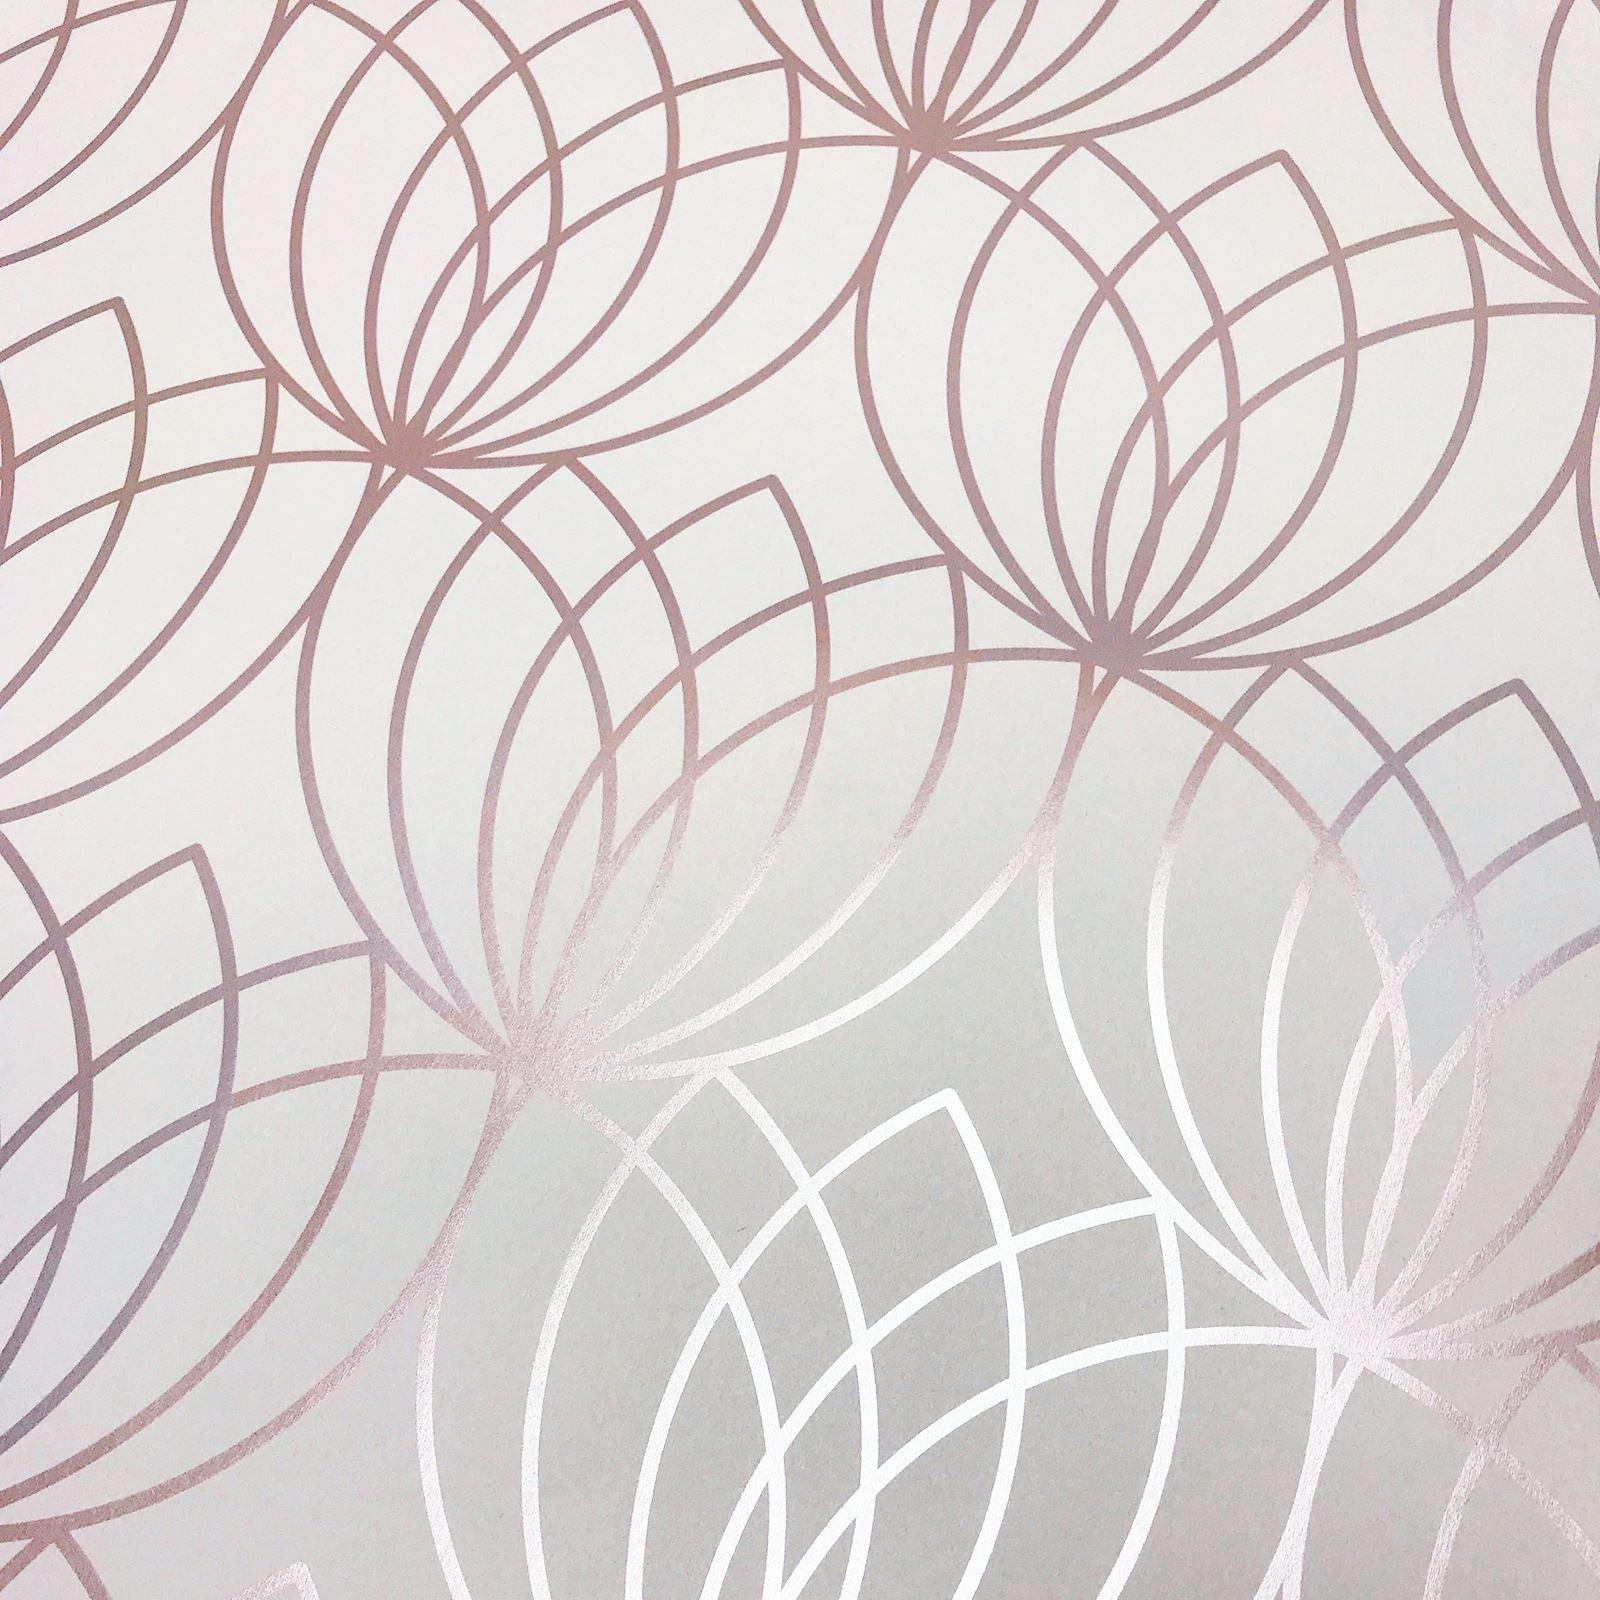 muriva rosa hell gold tapete lipsy pailletten metallik funkeln glizer ebay. Black Bedroom Furniture Sets. Home Design Ideas